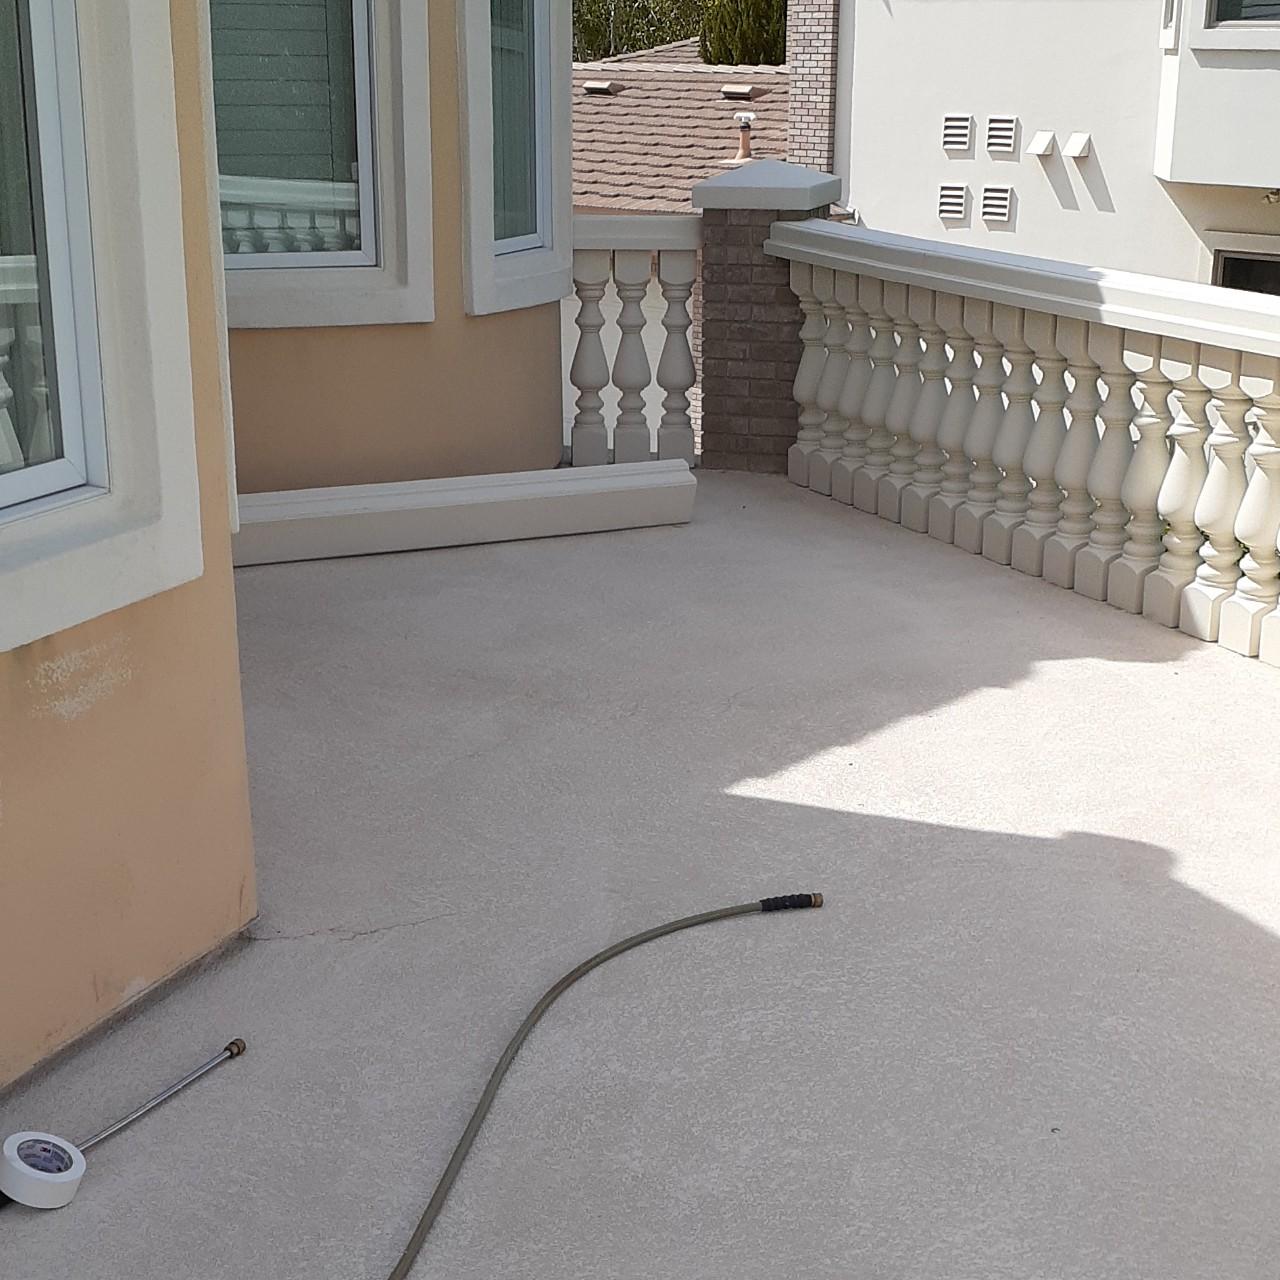 concrete-balcony-deck-restoration--before-12